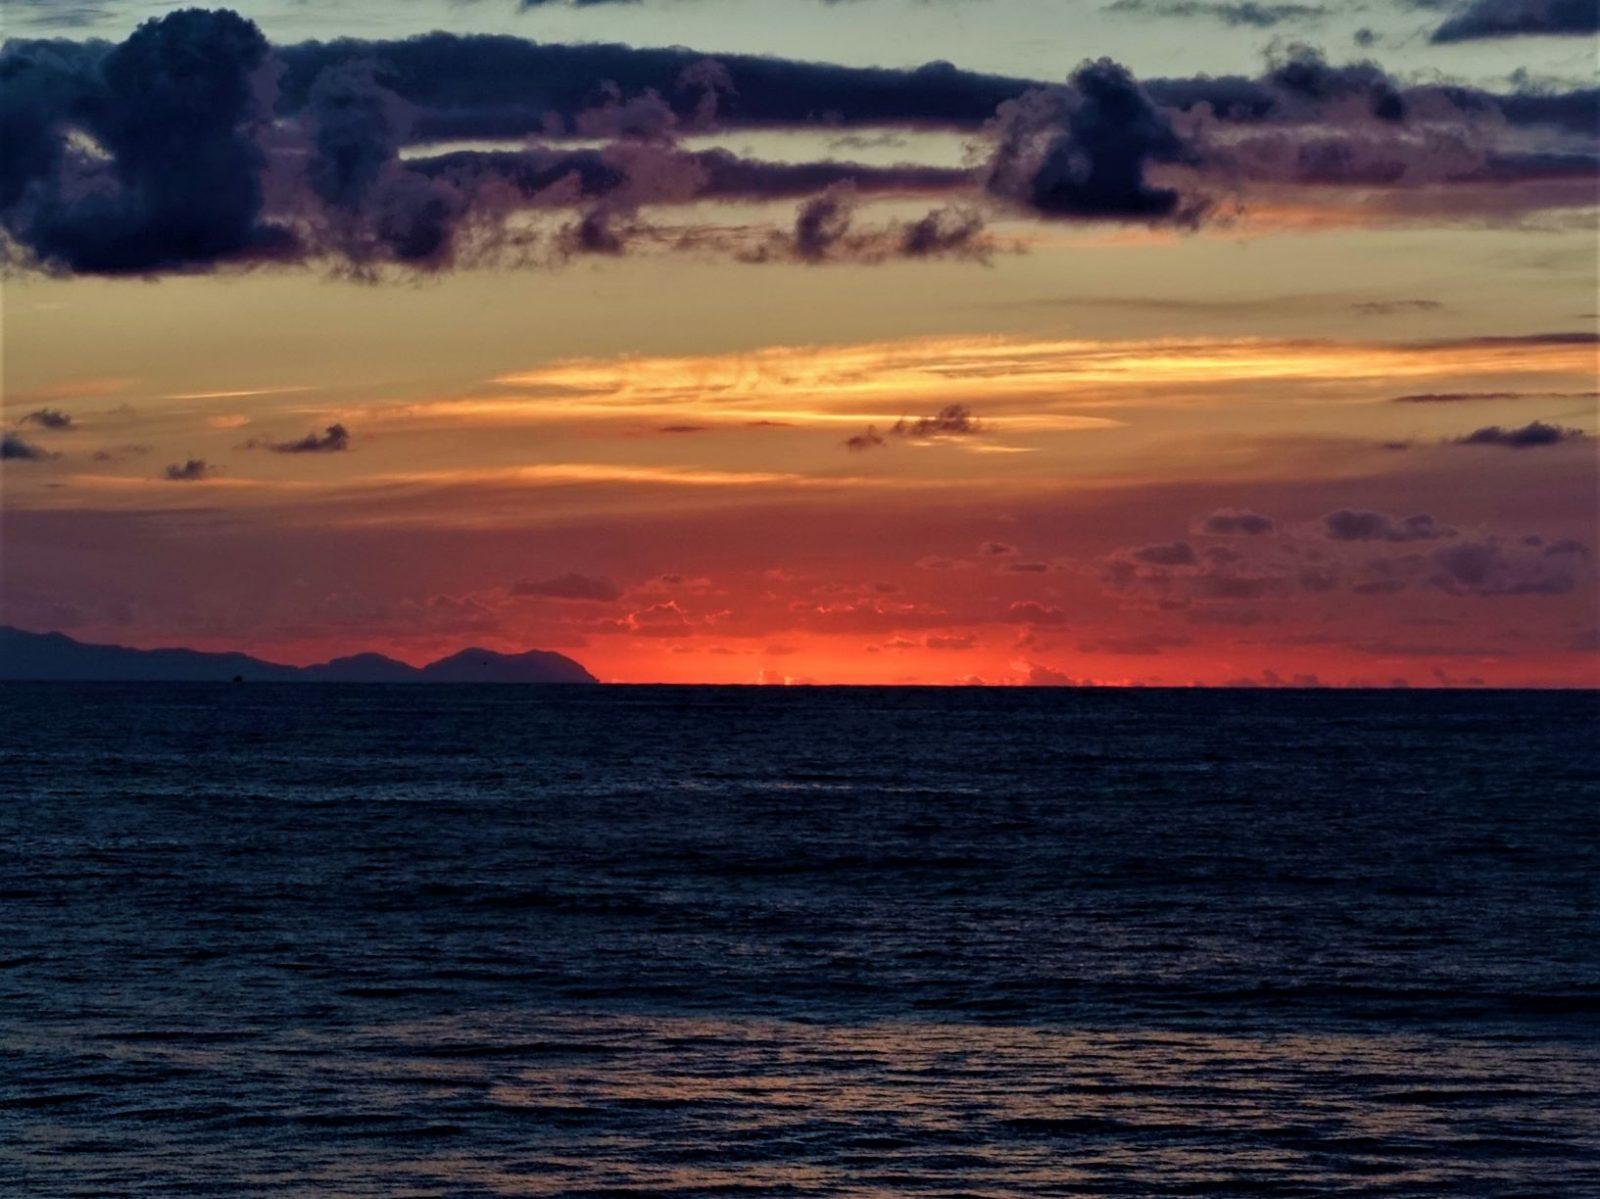 Solnedgang i Cefalu Sicilia